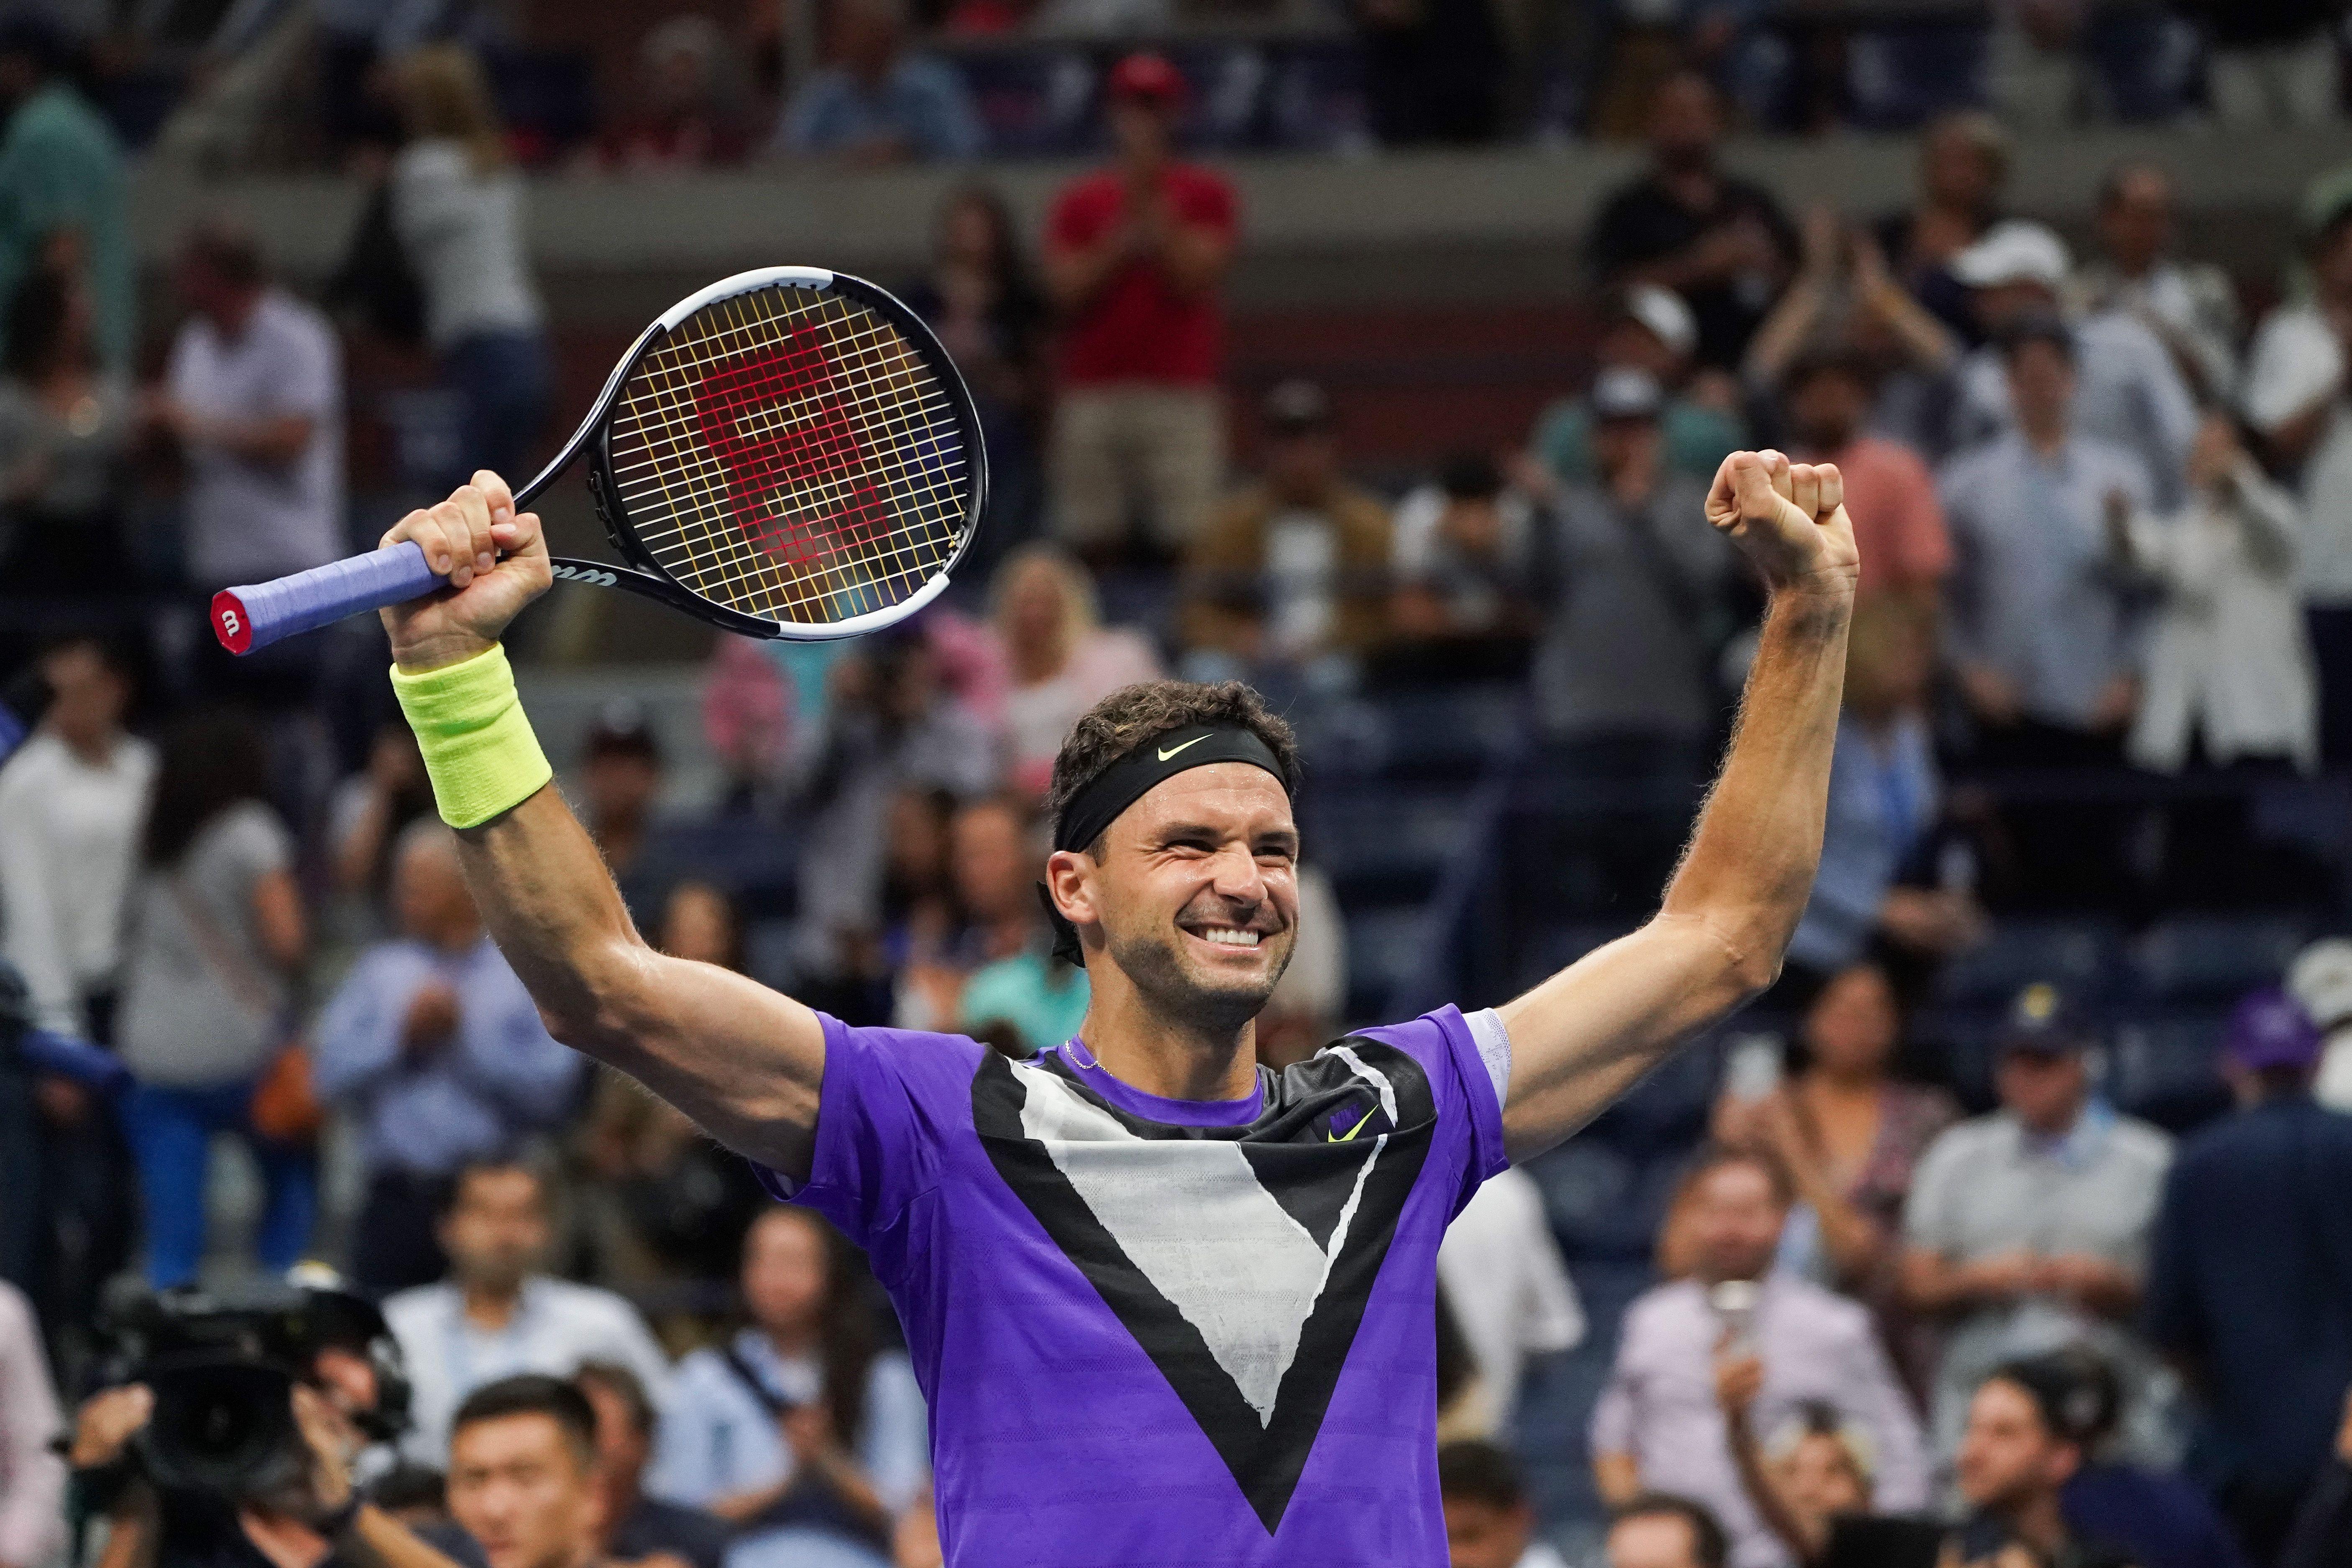 Grigor Dimitrov celebra su primera victoria ante Federer.